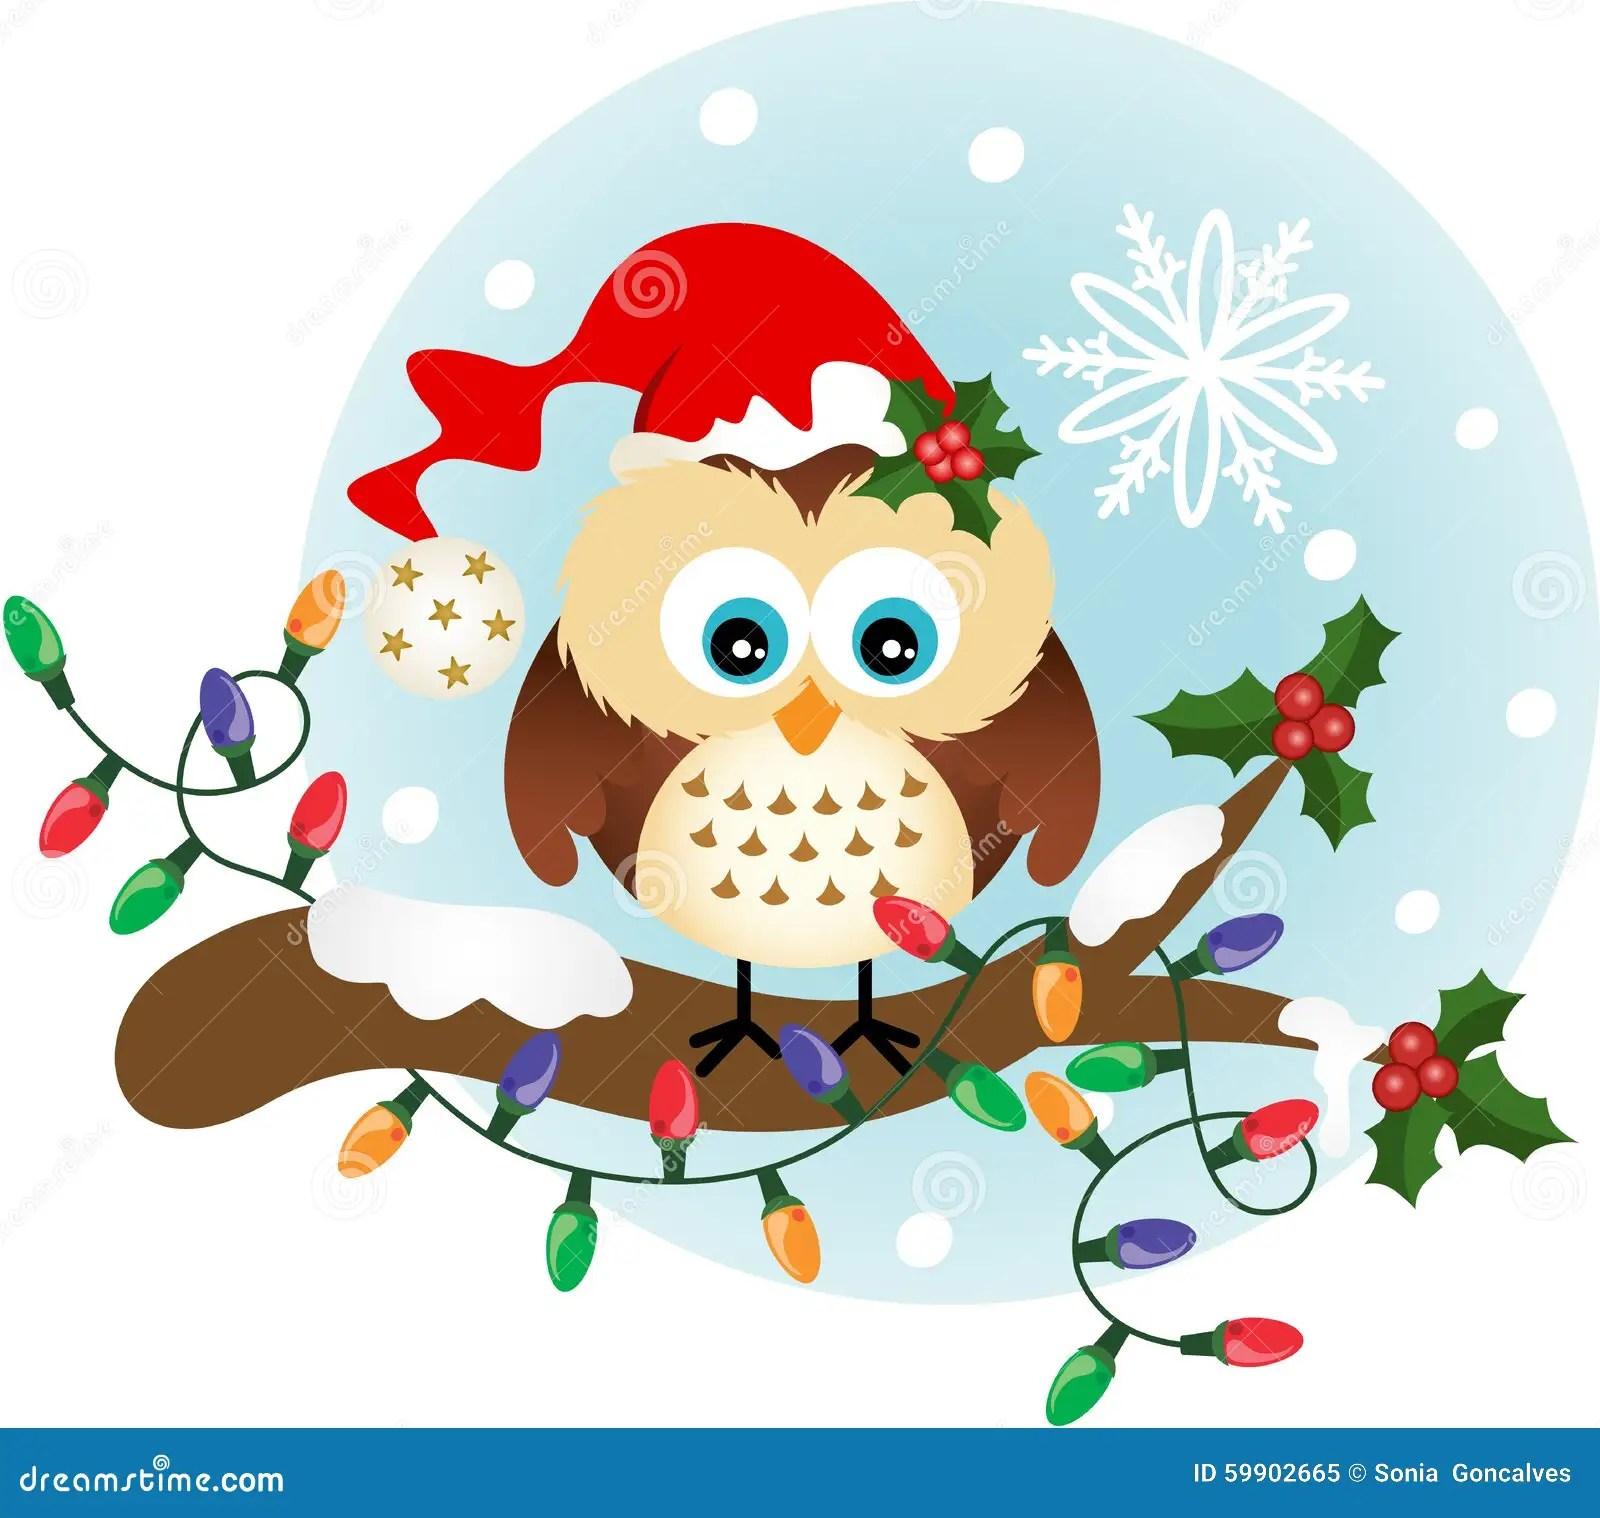 Cute Penguin Wallpaper Hd Christmas Owl On Holly Branch Stock Vector Illustration